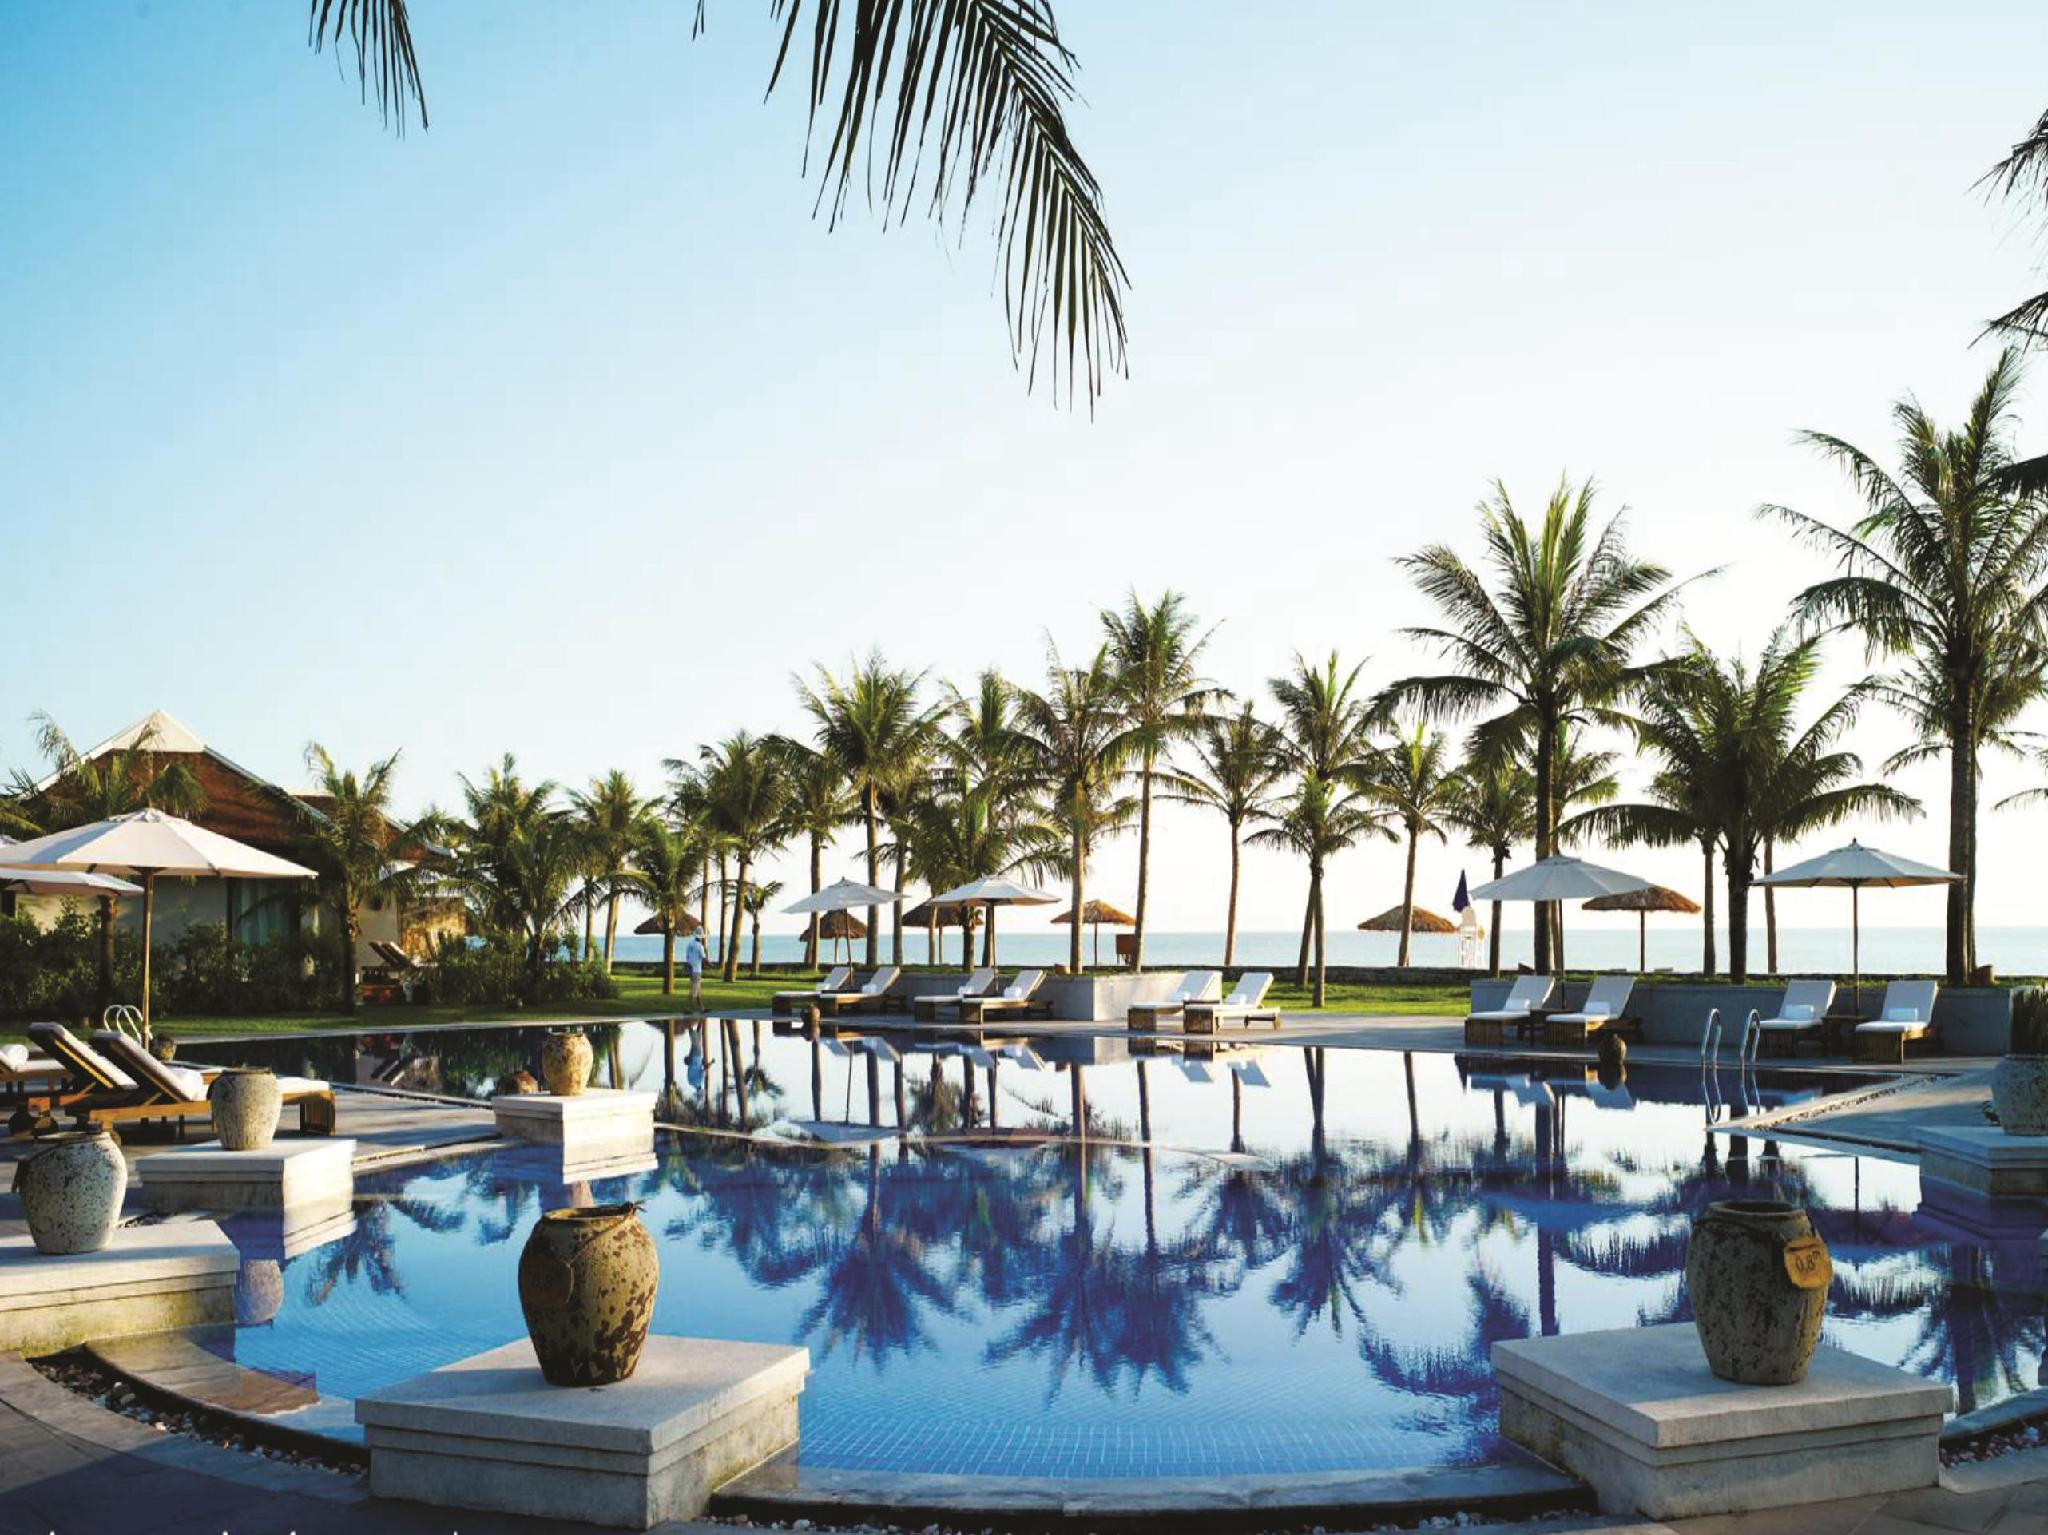 Ana Mandara Hue Beach Resort - Hue